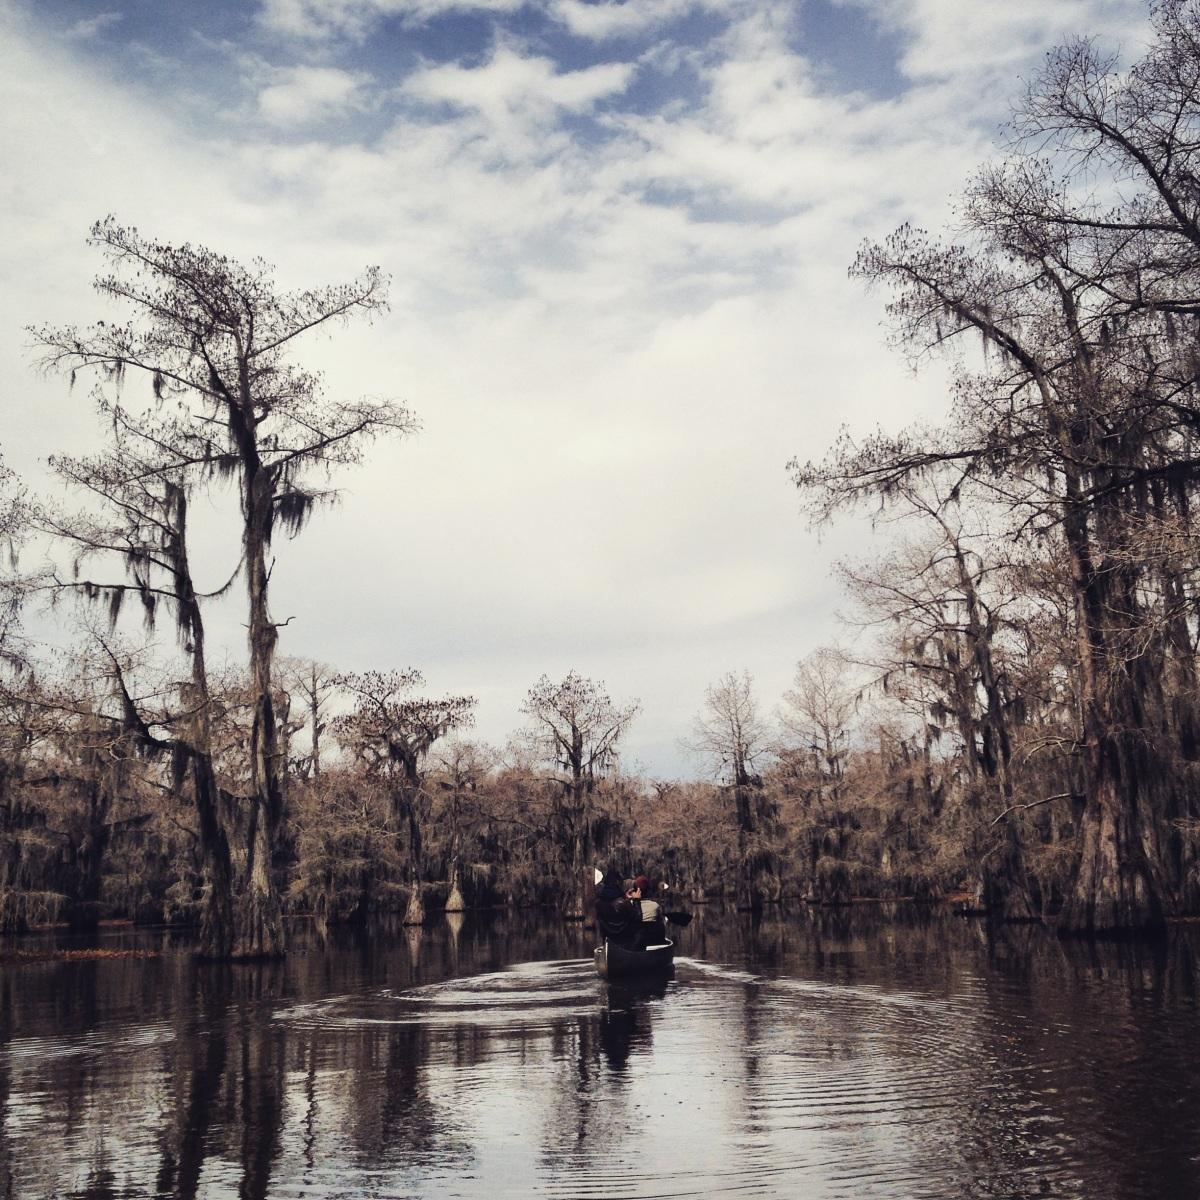 9 Karnack Texas Caddo Lake State Park 52 Cities